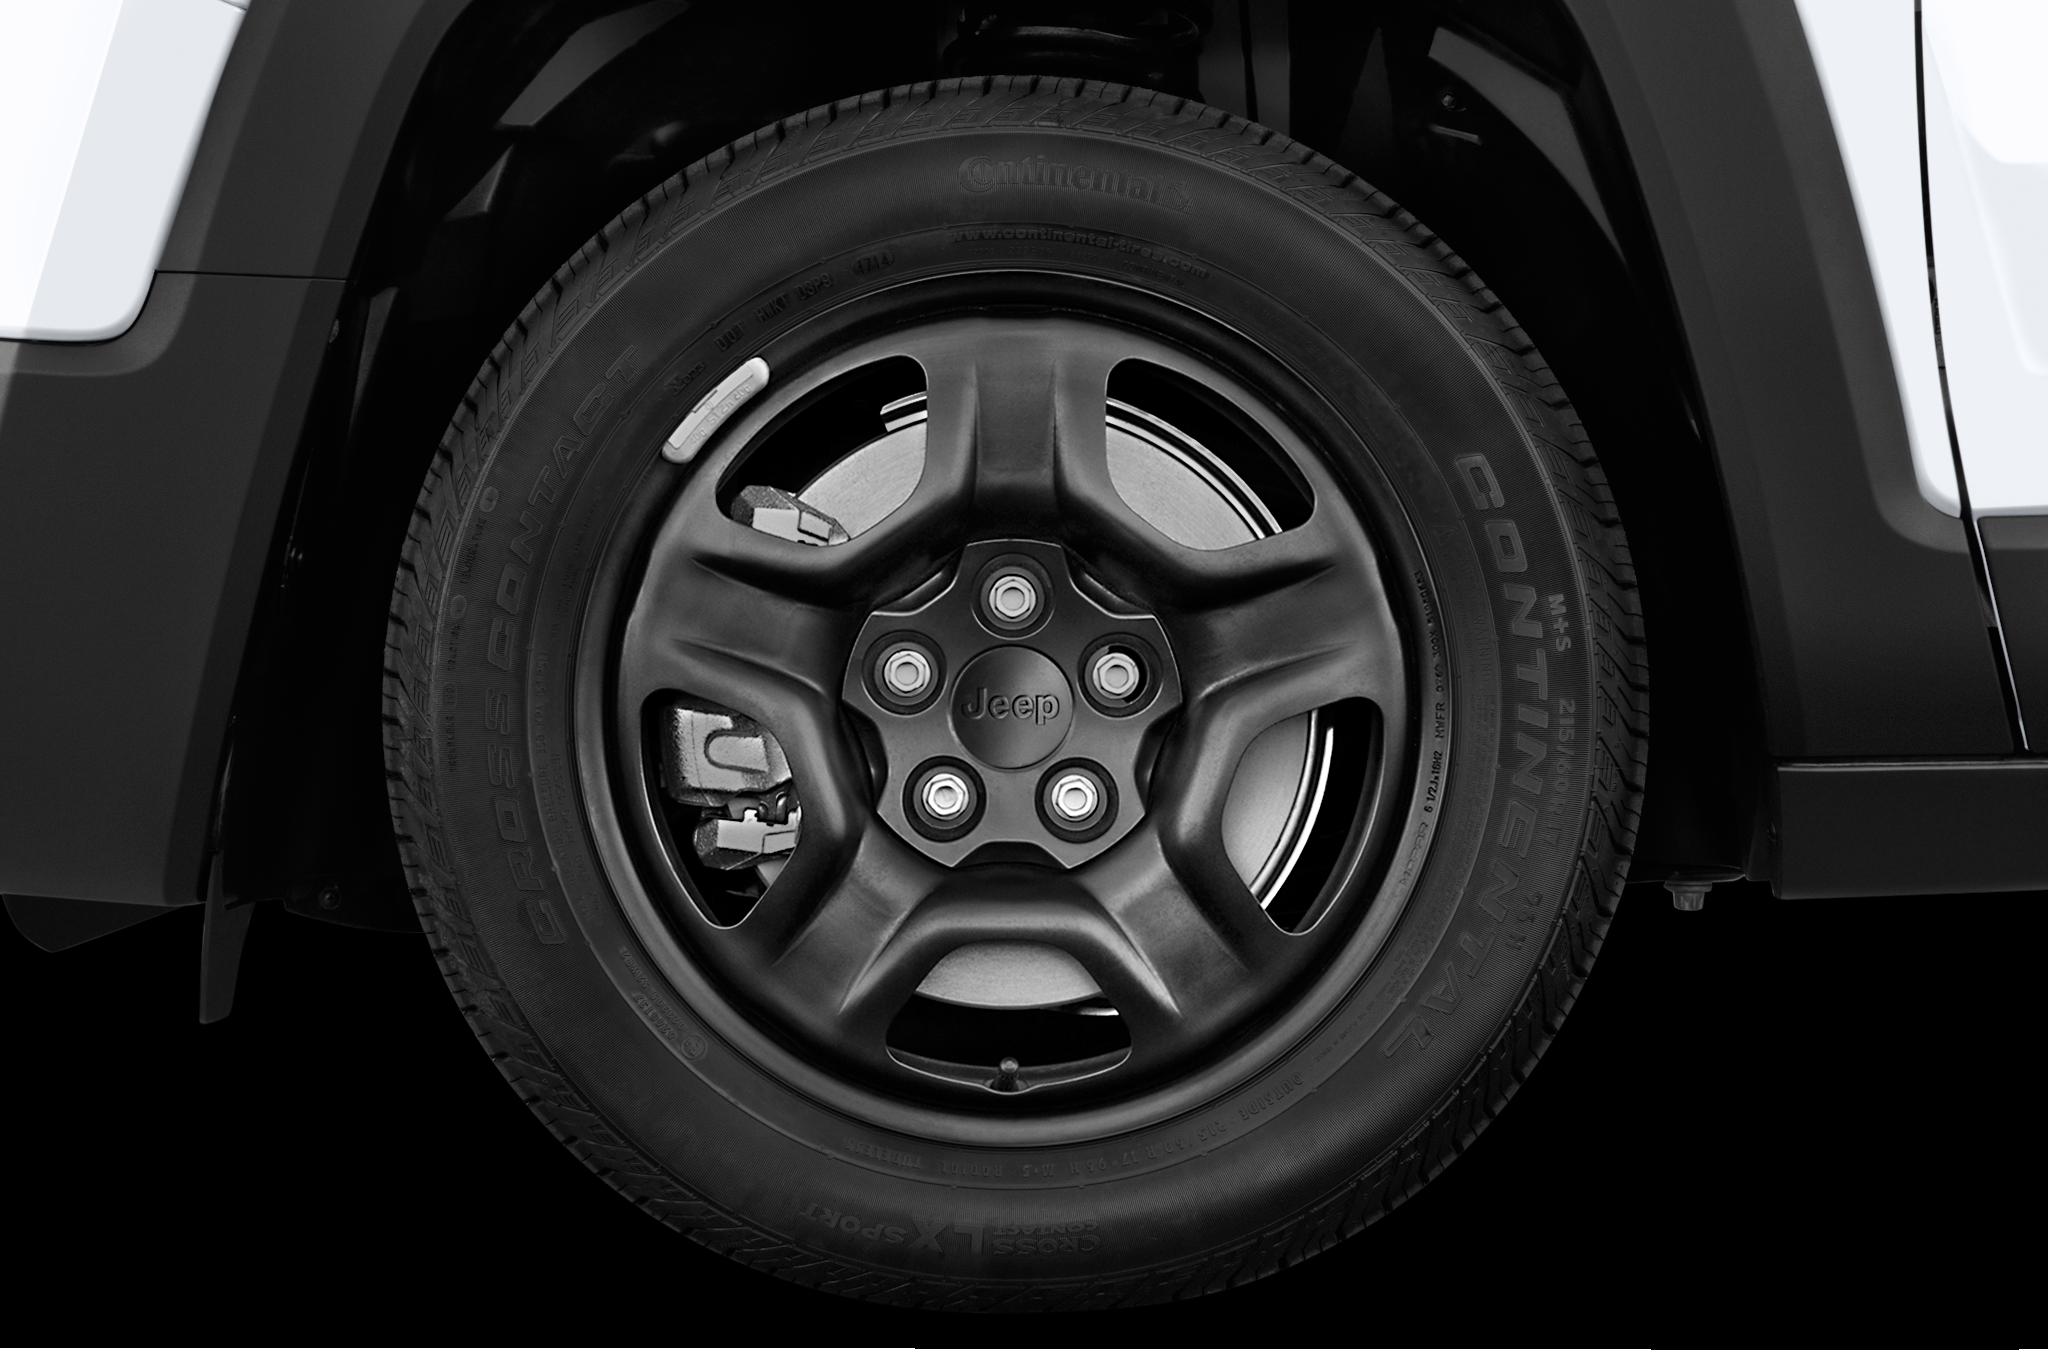 Jeep Renegade Sport Fwd Suv Wheel Cap on 2016 Jeep Renegade Suv